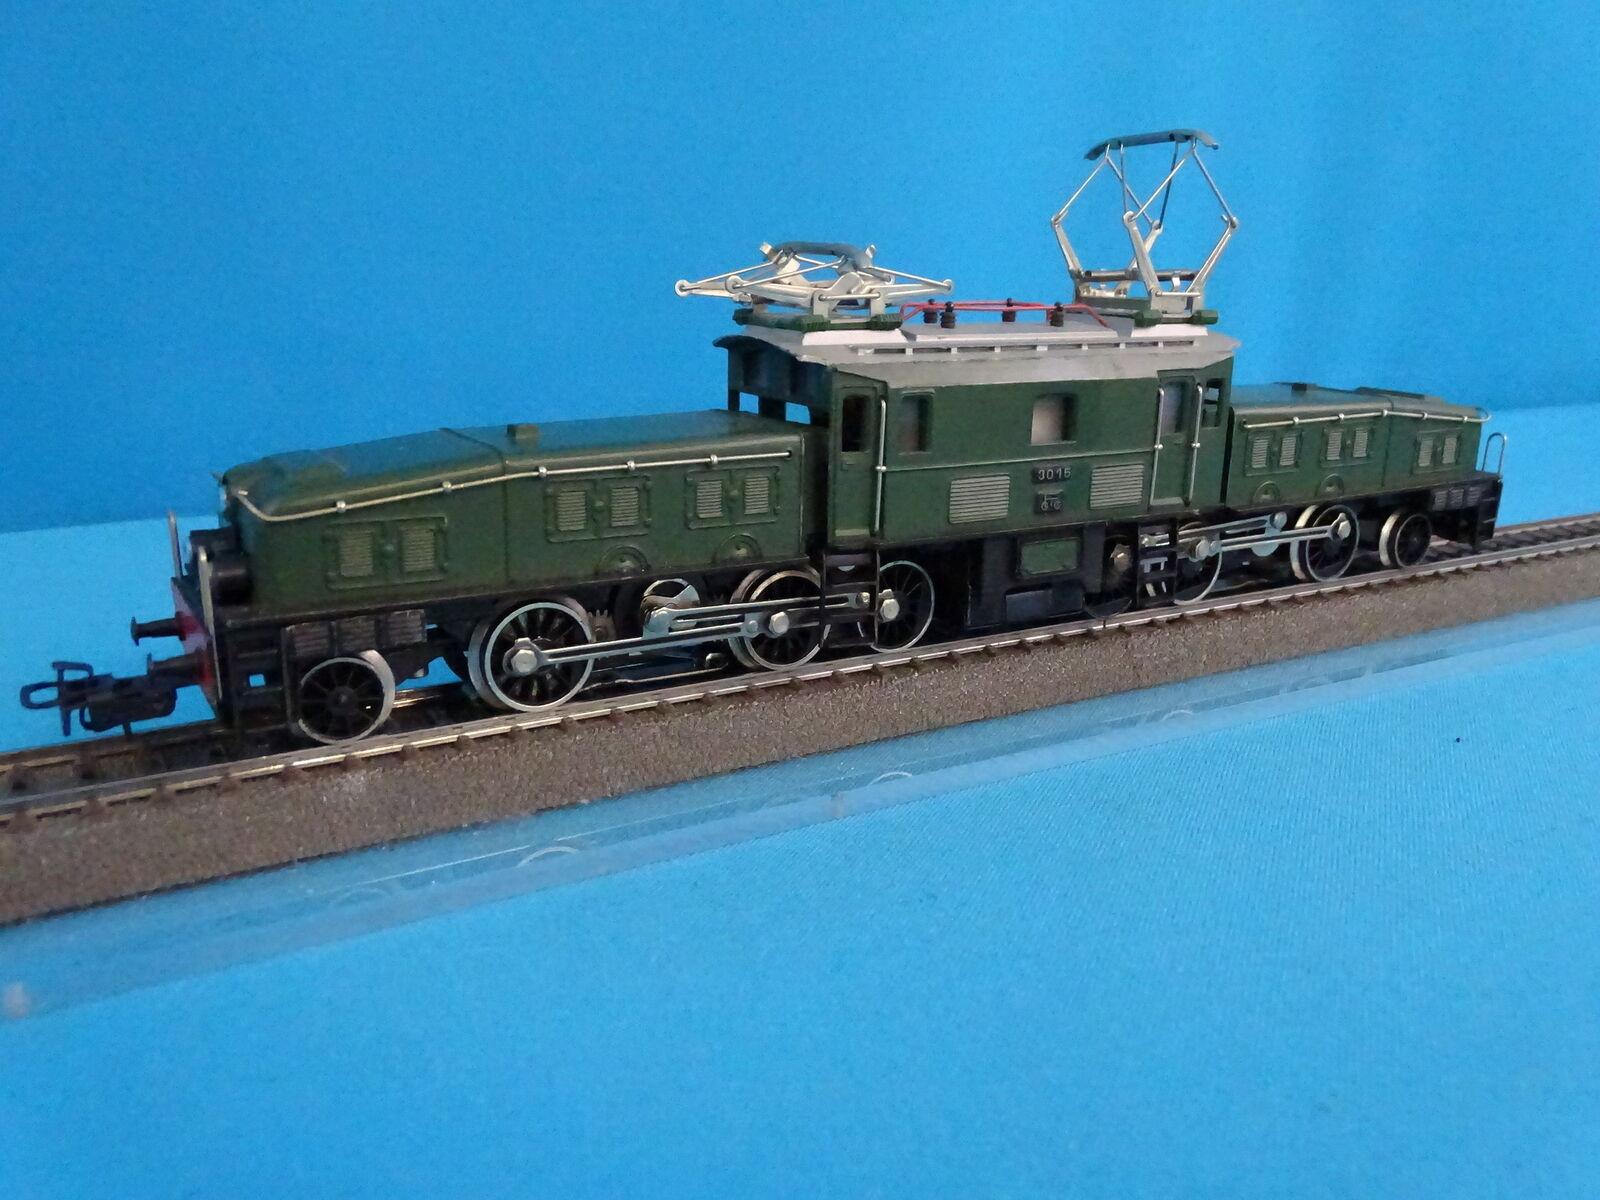 Marklin 3015 SBB CFF Electric Locomotive Br CE 6/8 Krokodil Green AS NEW